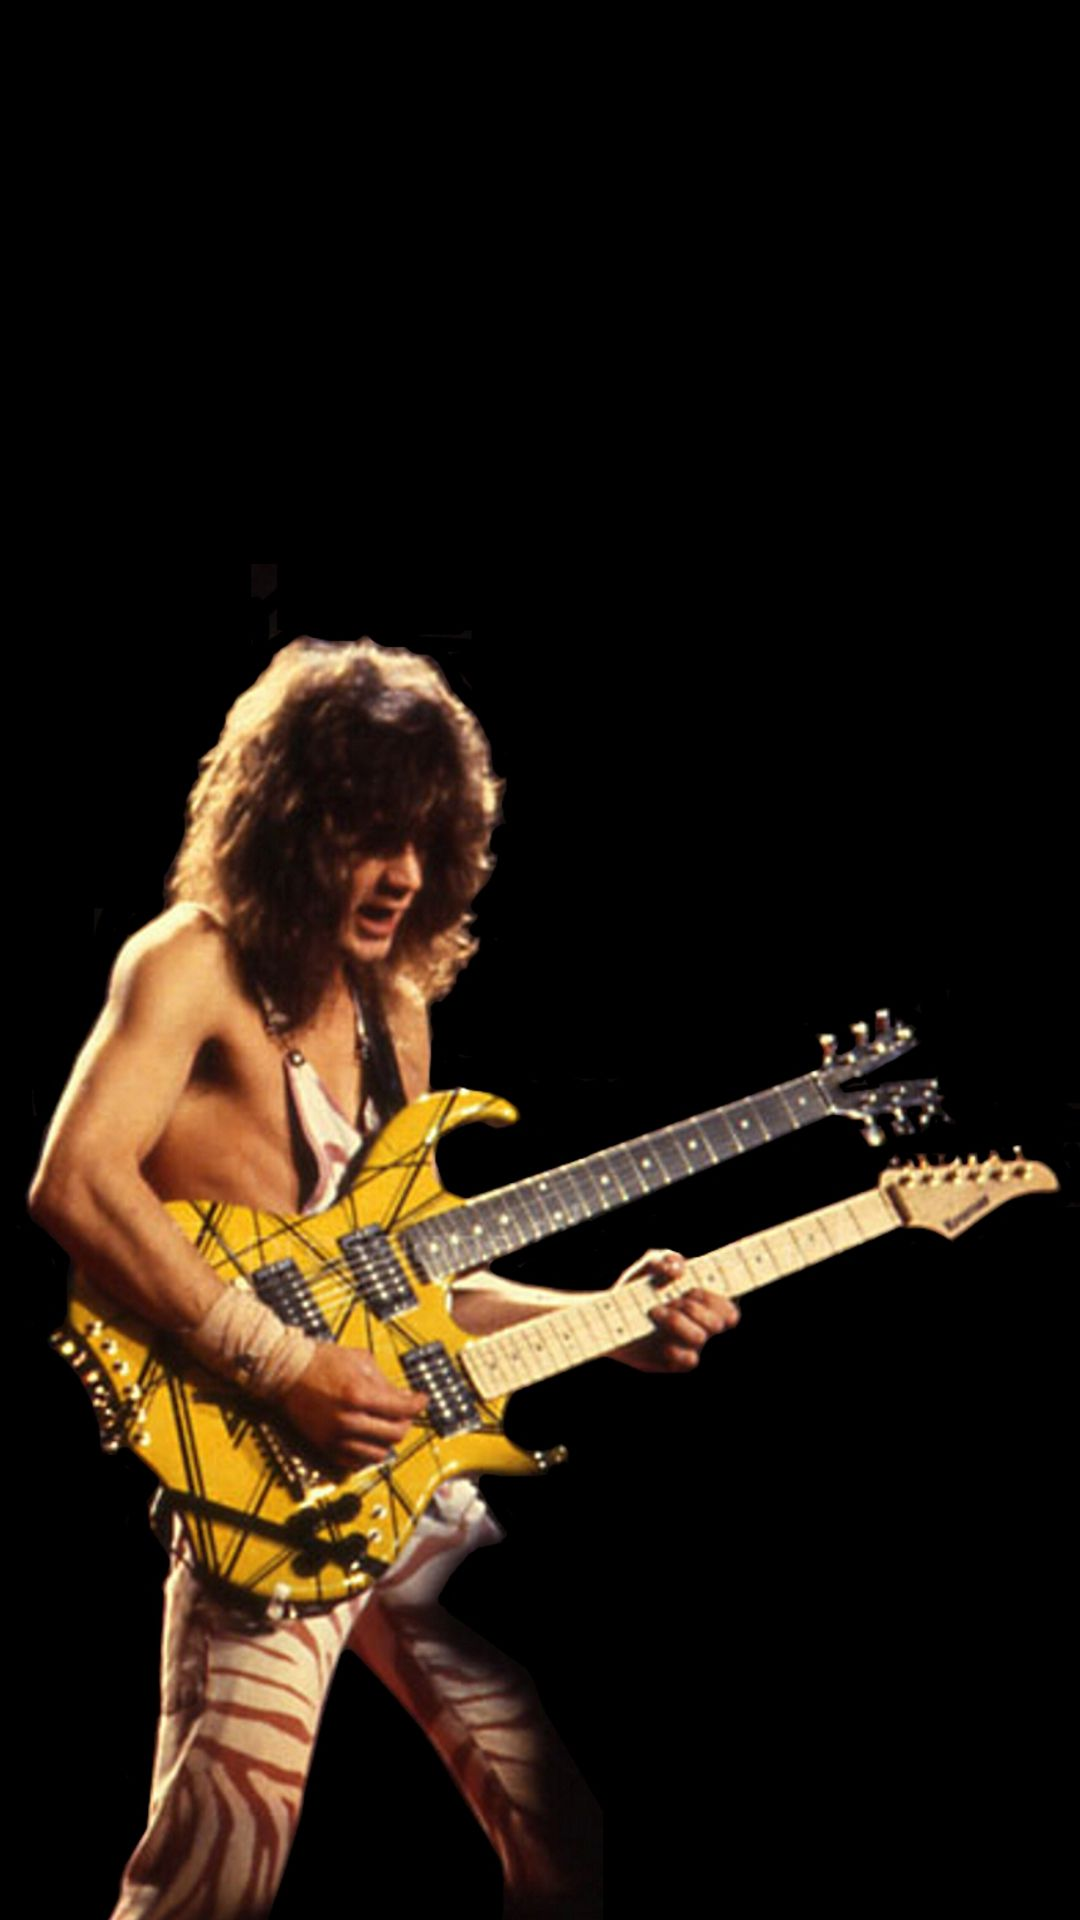 Van Halen Van Halen Eddie Van Halen Halen